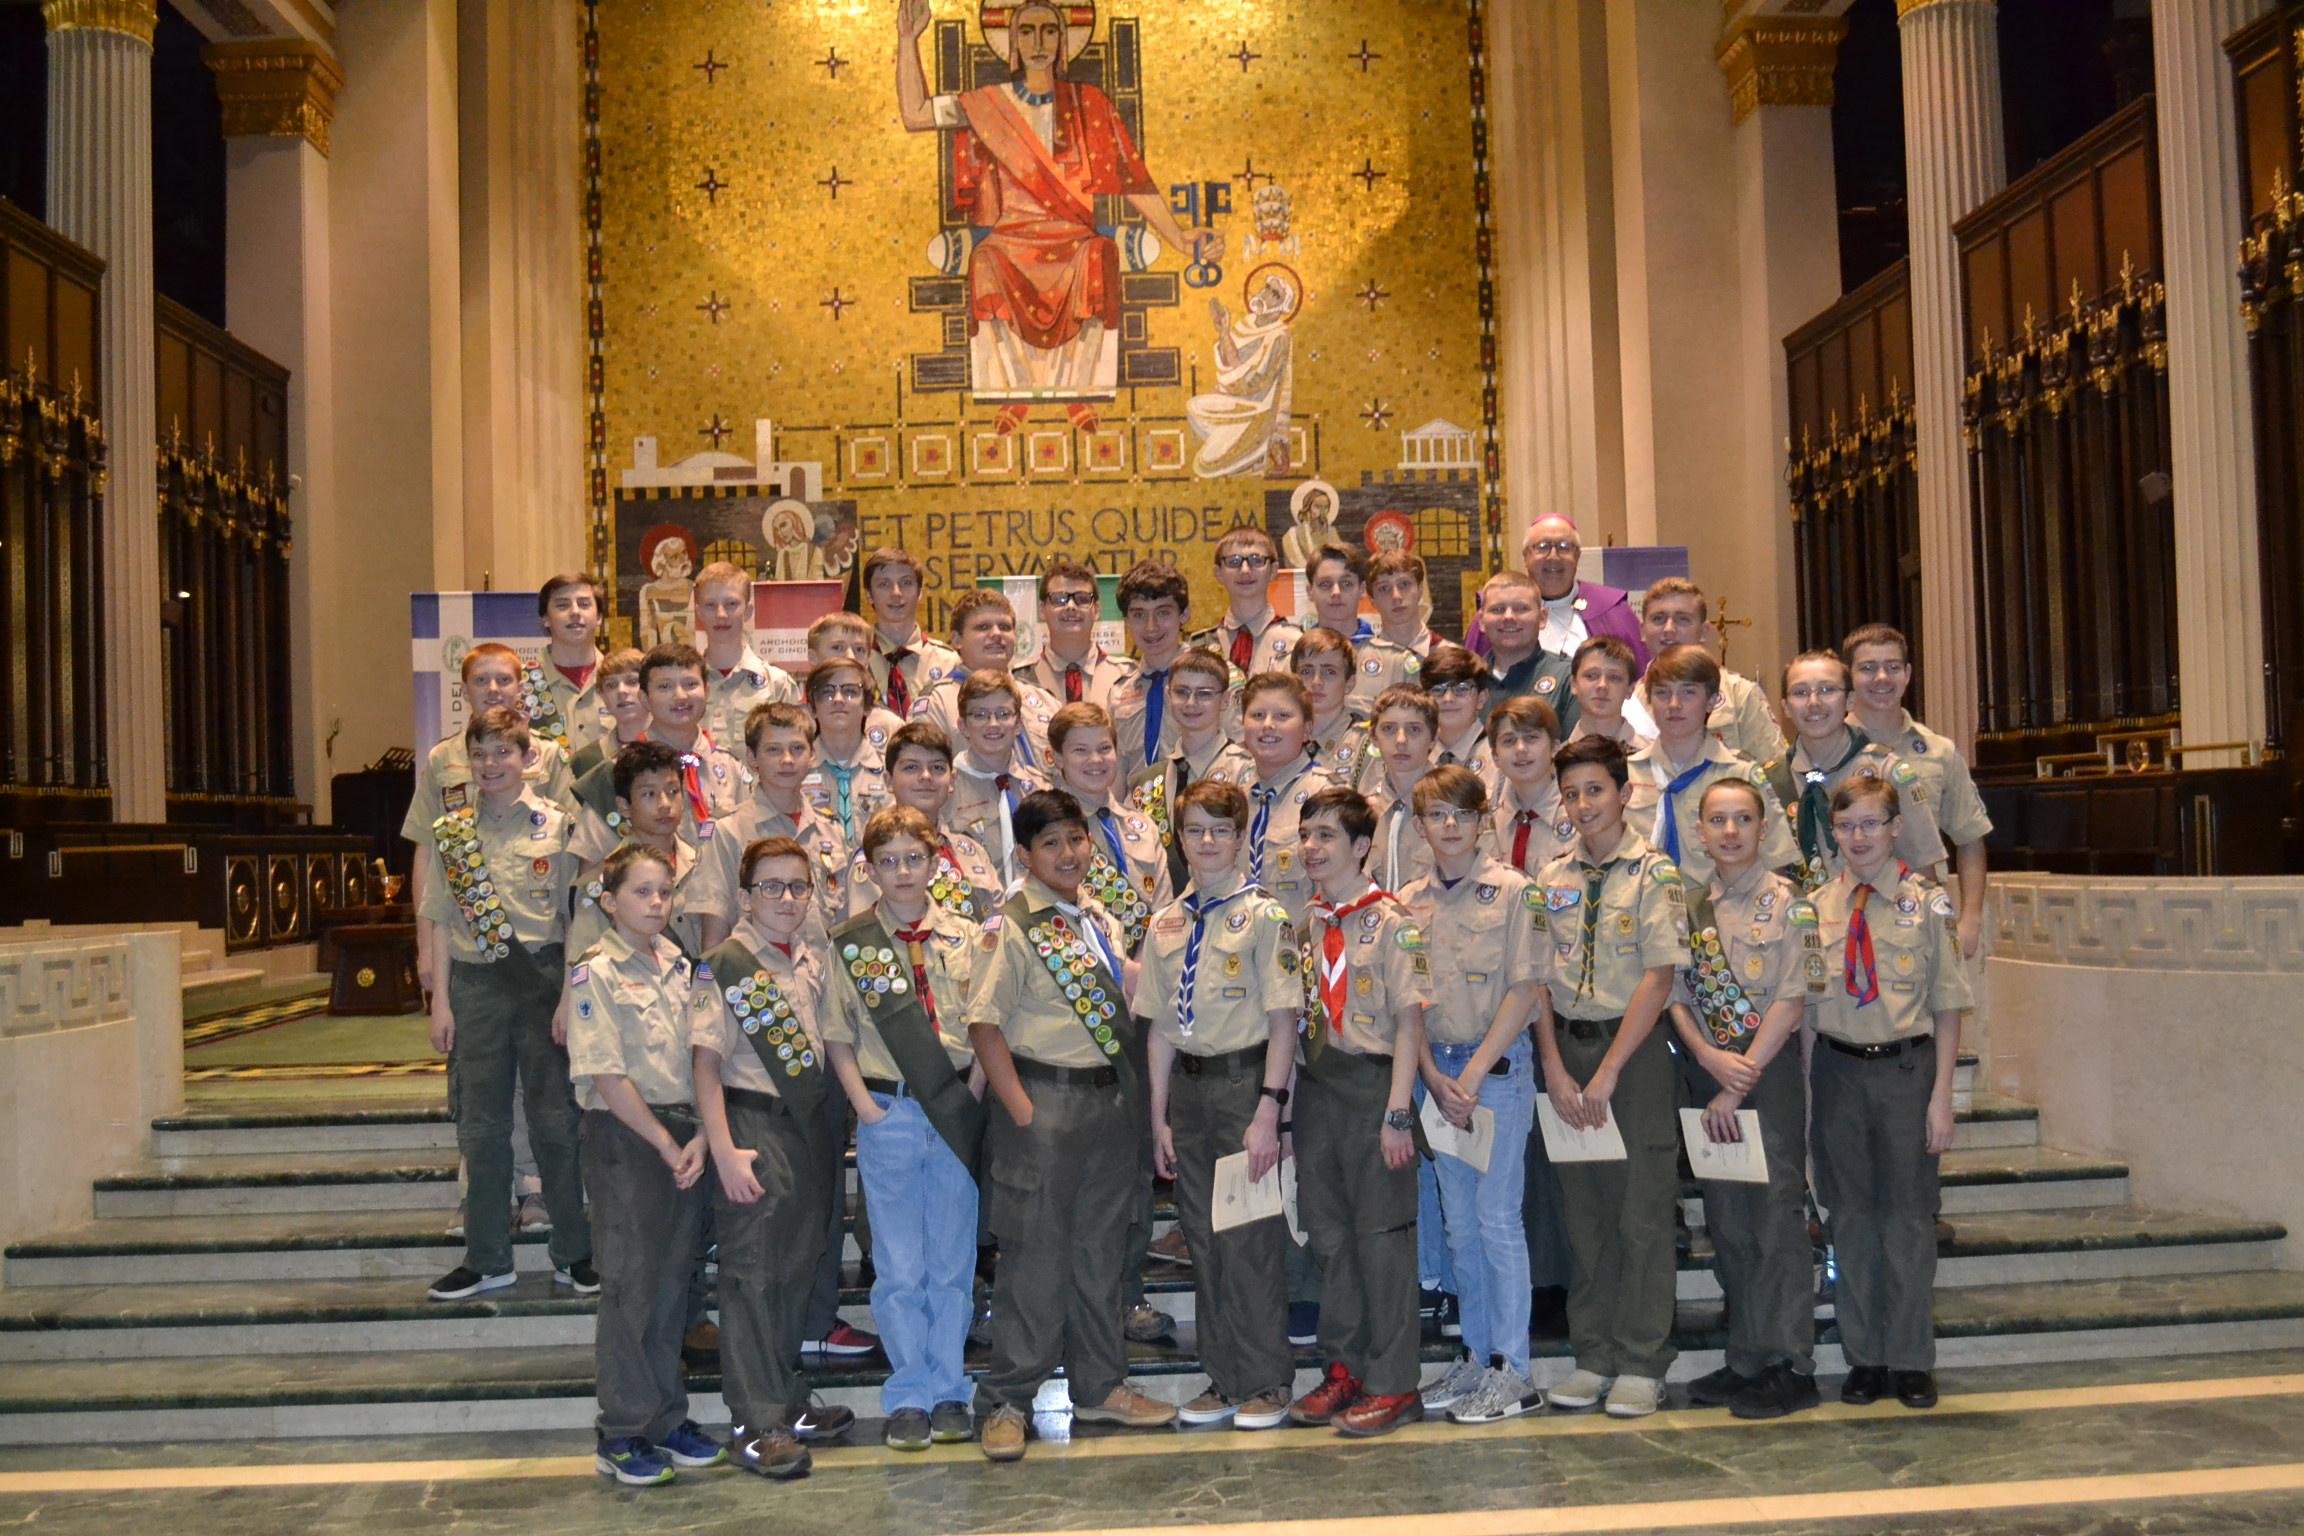 Ad Altare Dei recipients at the 2018 Religious Emblems Ceremony (CT Photo/Greg Hartman)